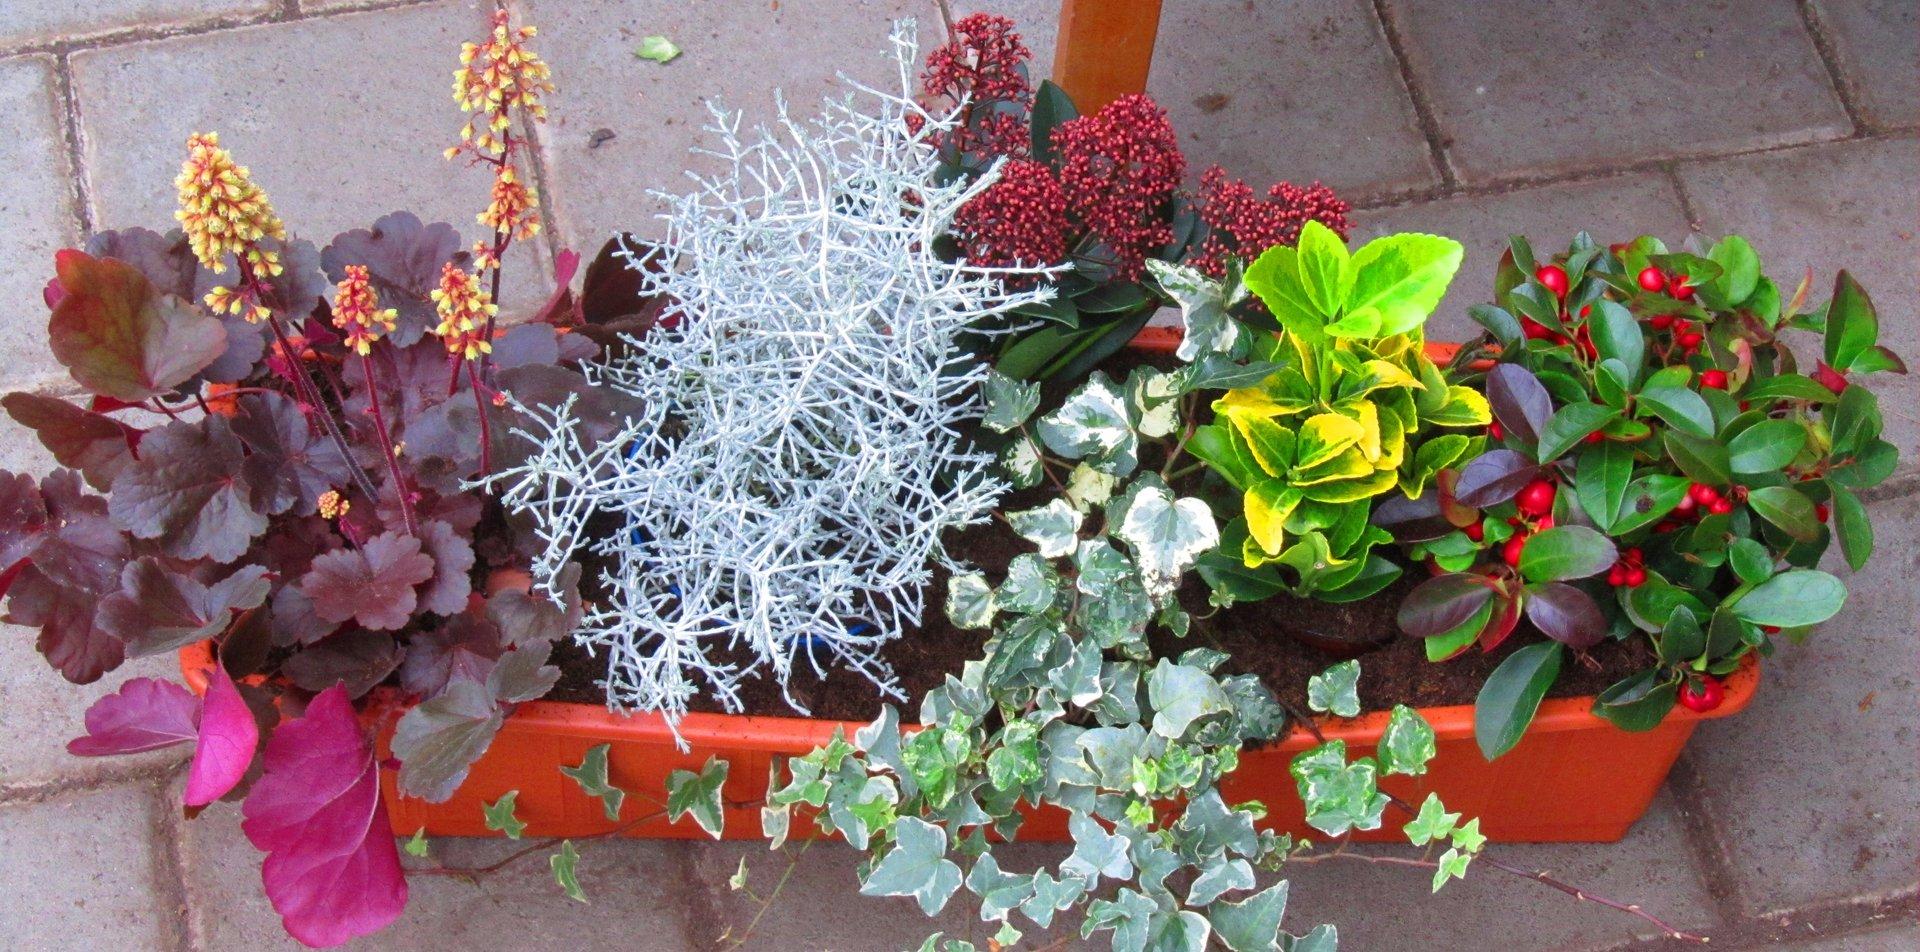 Balkonpflanzen Set Fur Balkonkasten 60 Cm Lang Pflanzen Versand